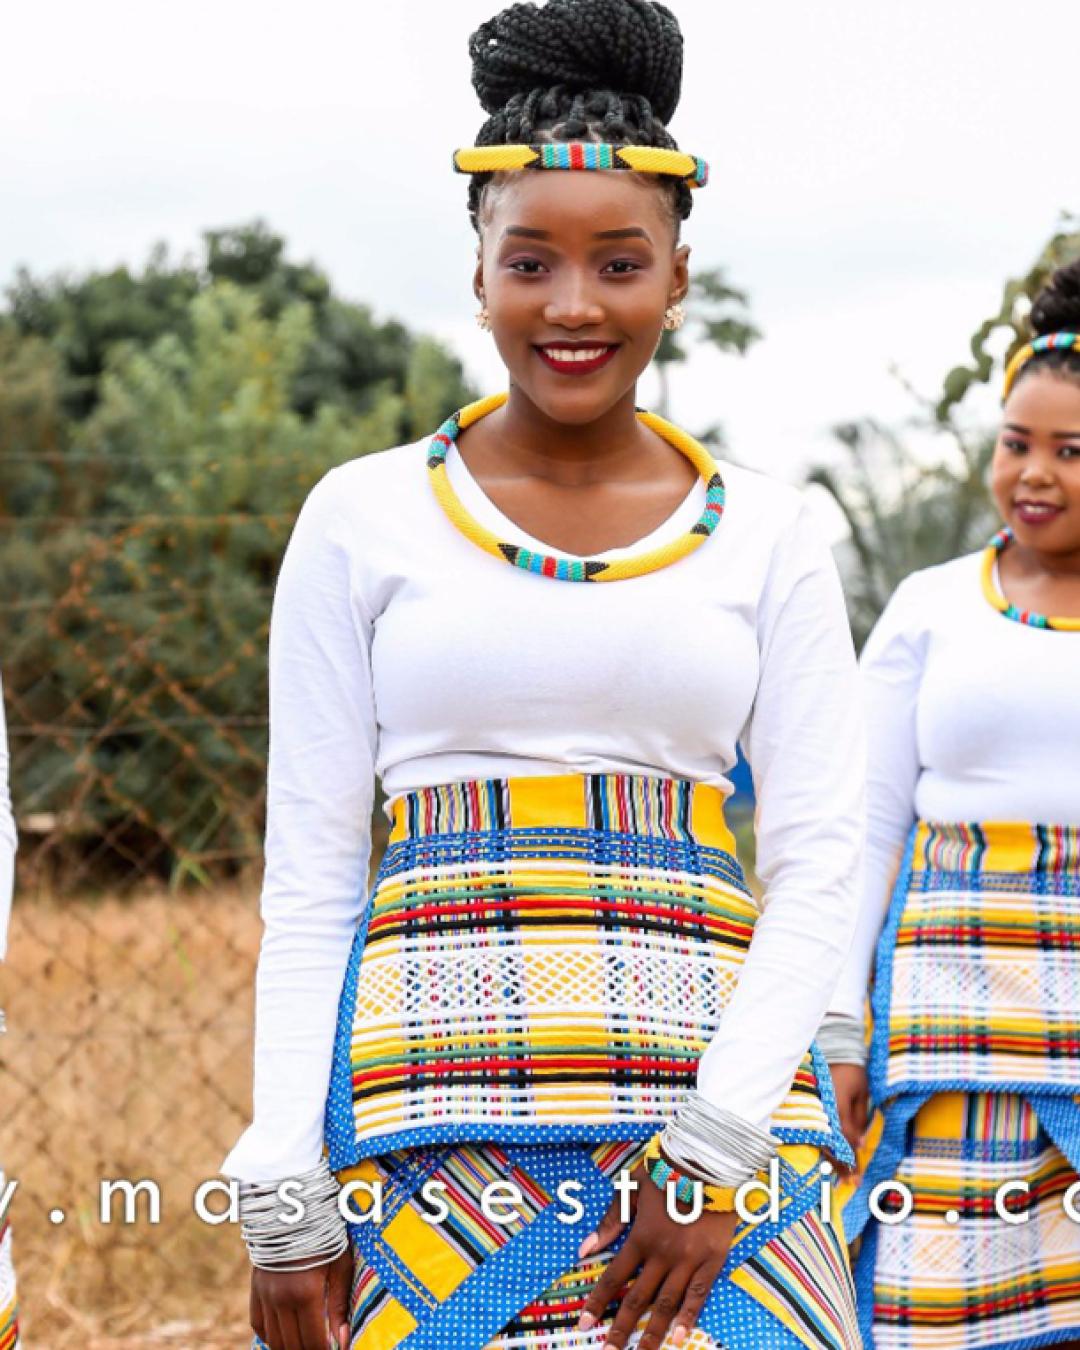 Venda Traditional Modern Dresses: Tshi-Venda Traditional Attire